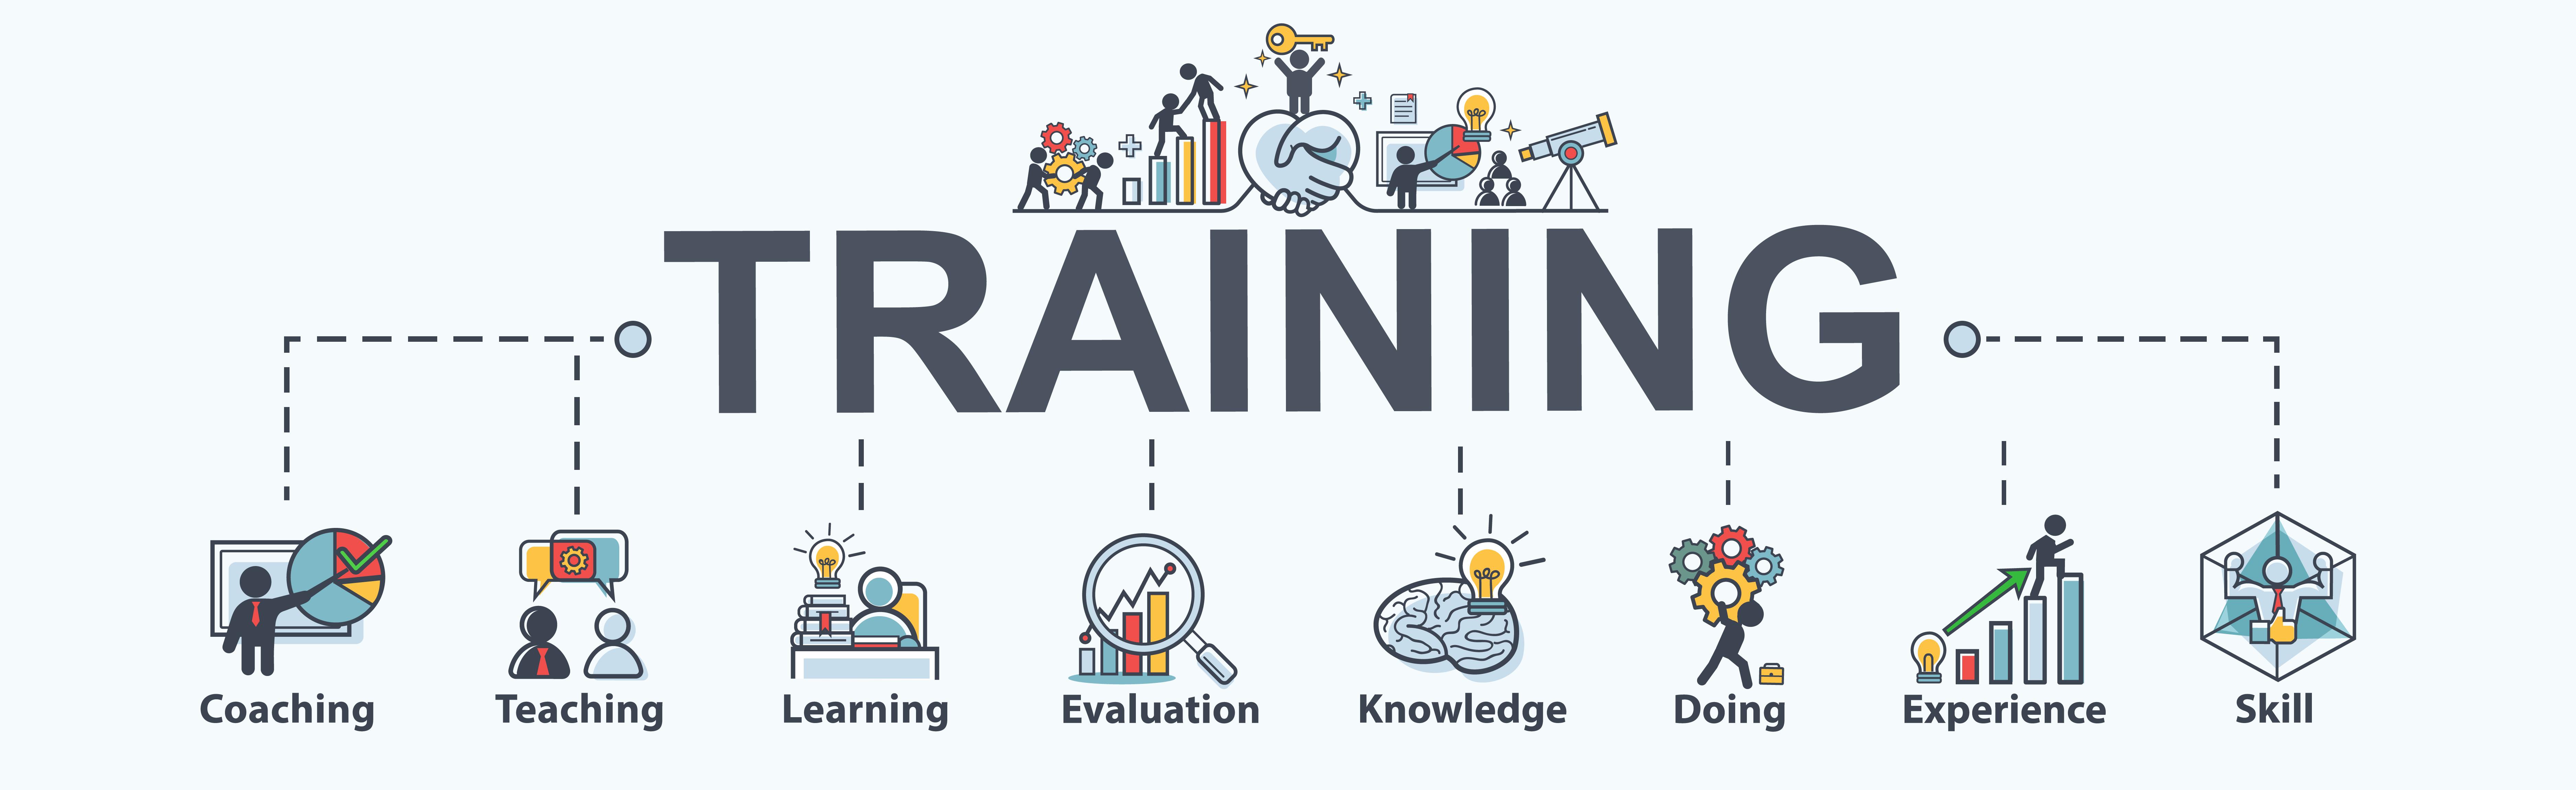 cross training employees, benefits of cross training employees